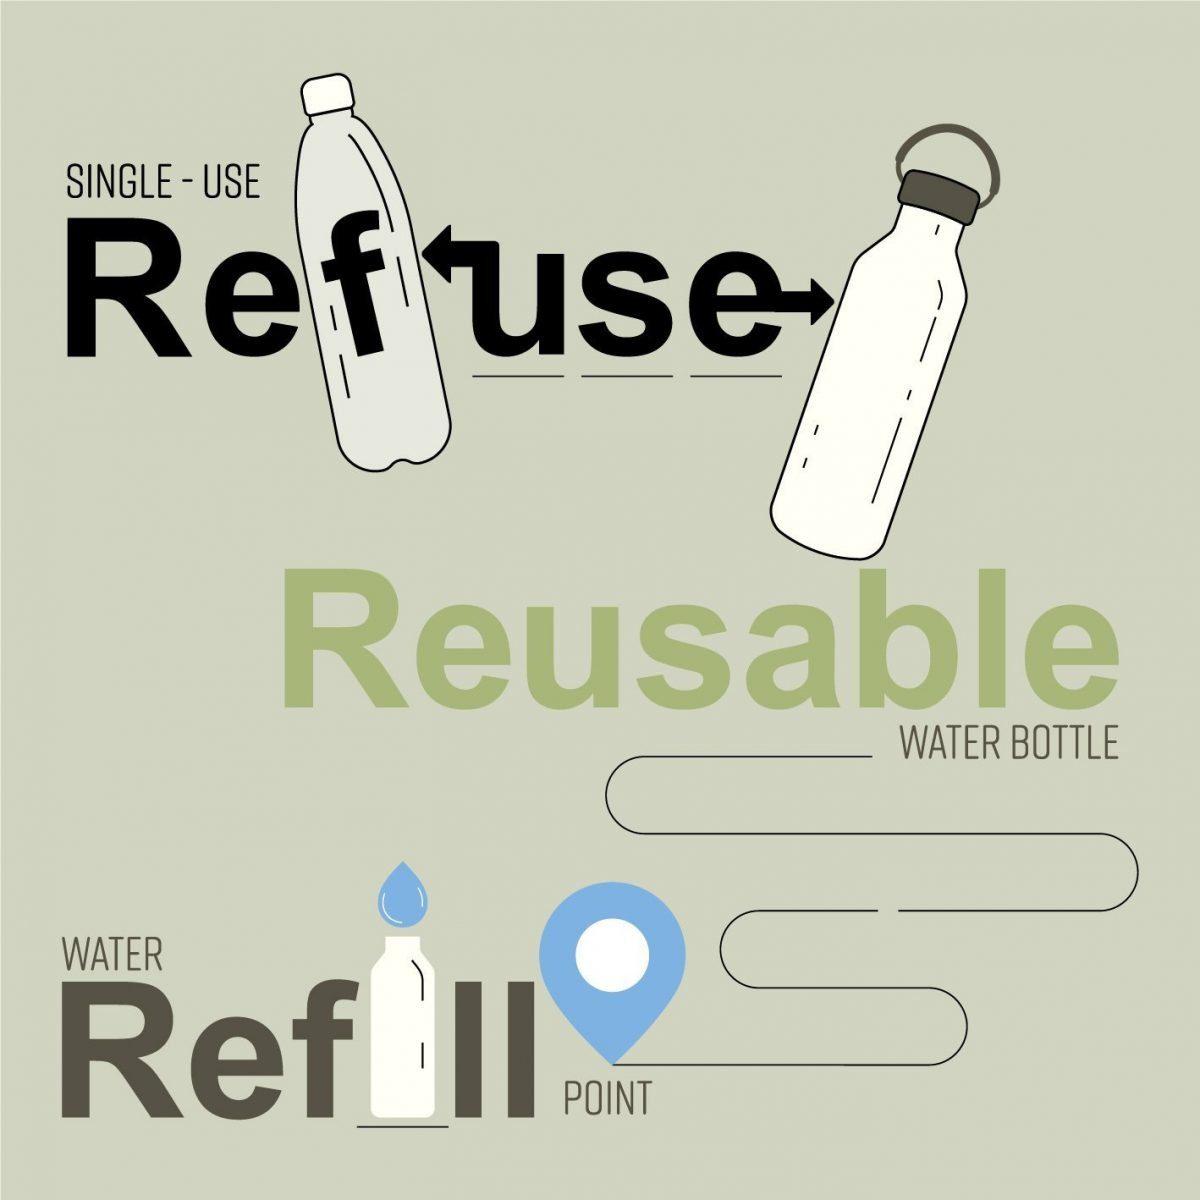 International Plastic Bag Free Day: Reuse Plastic bottles